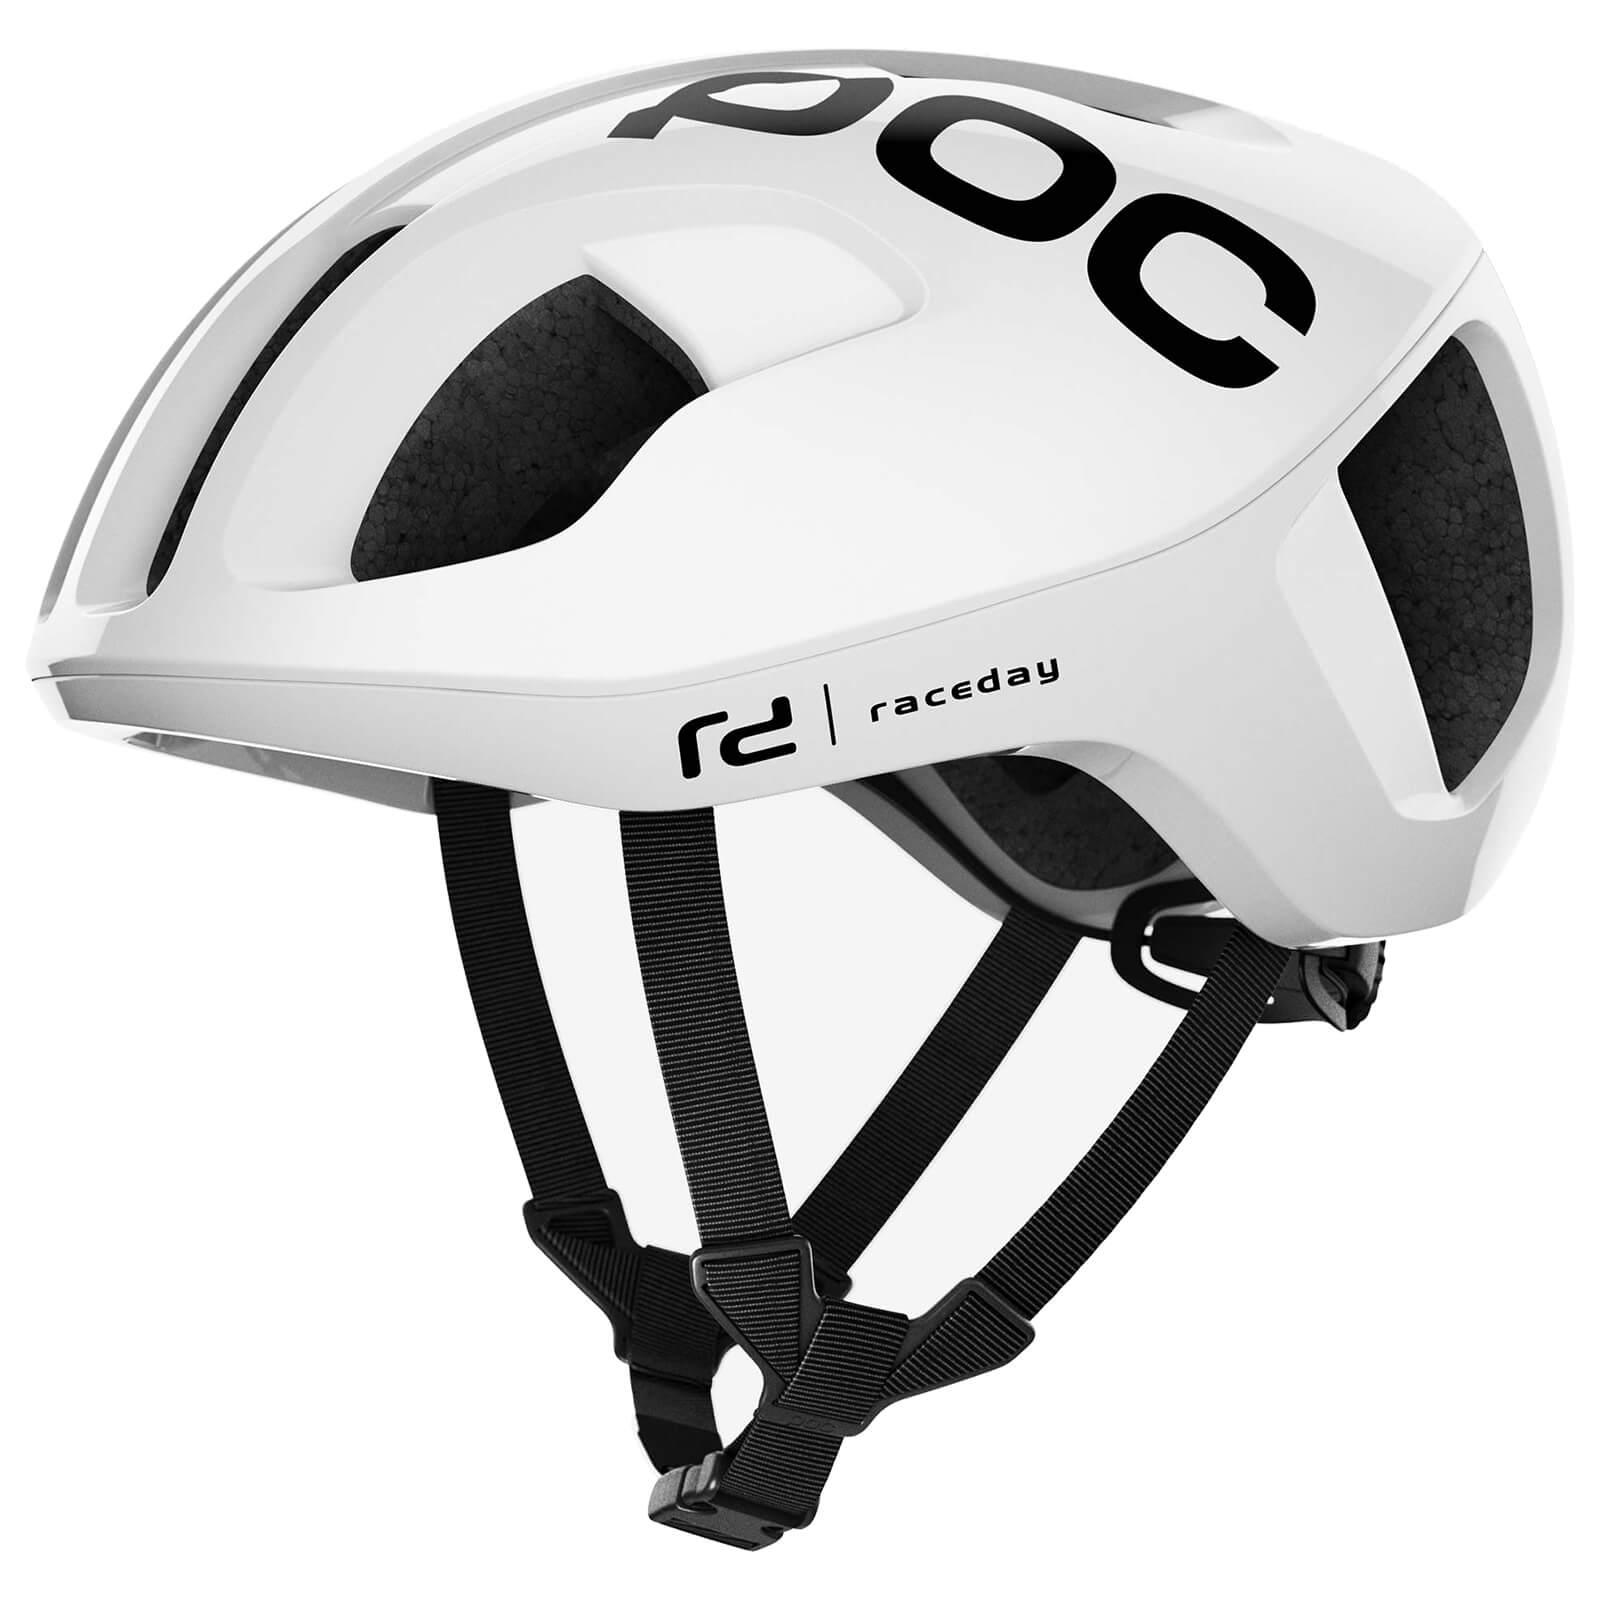 POC Ventral SPIN Helmet - L/56-62cm - Hydrogen White Raceday